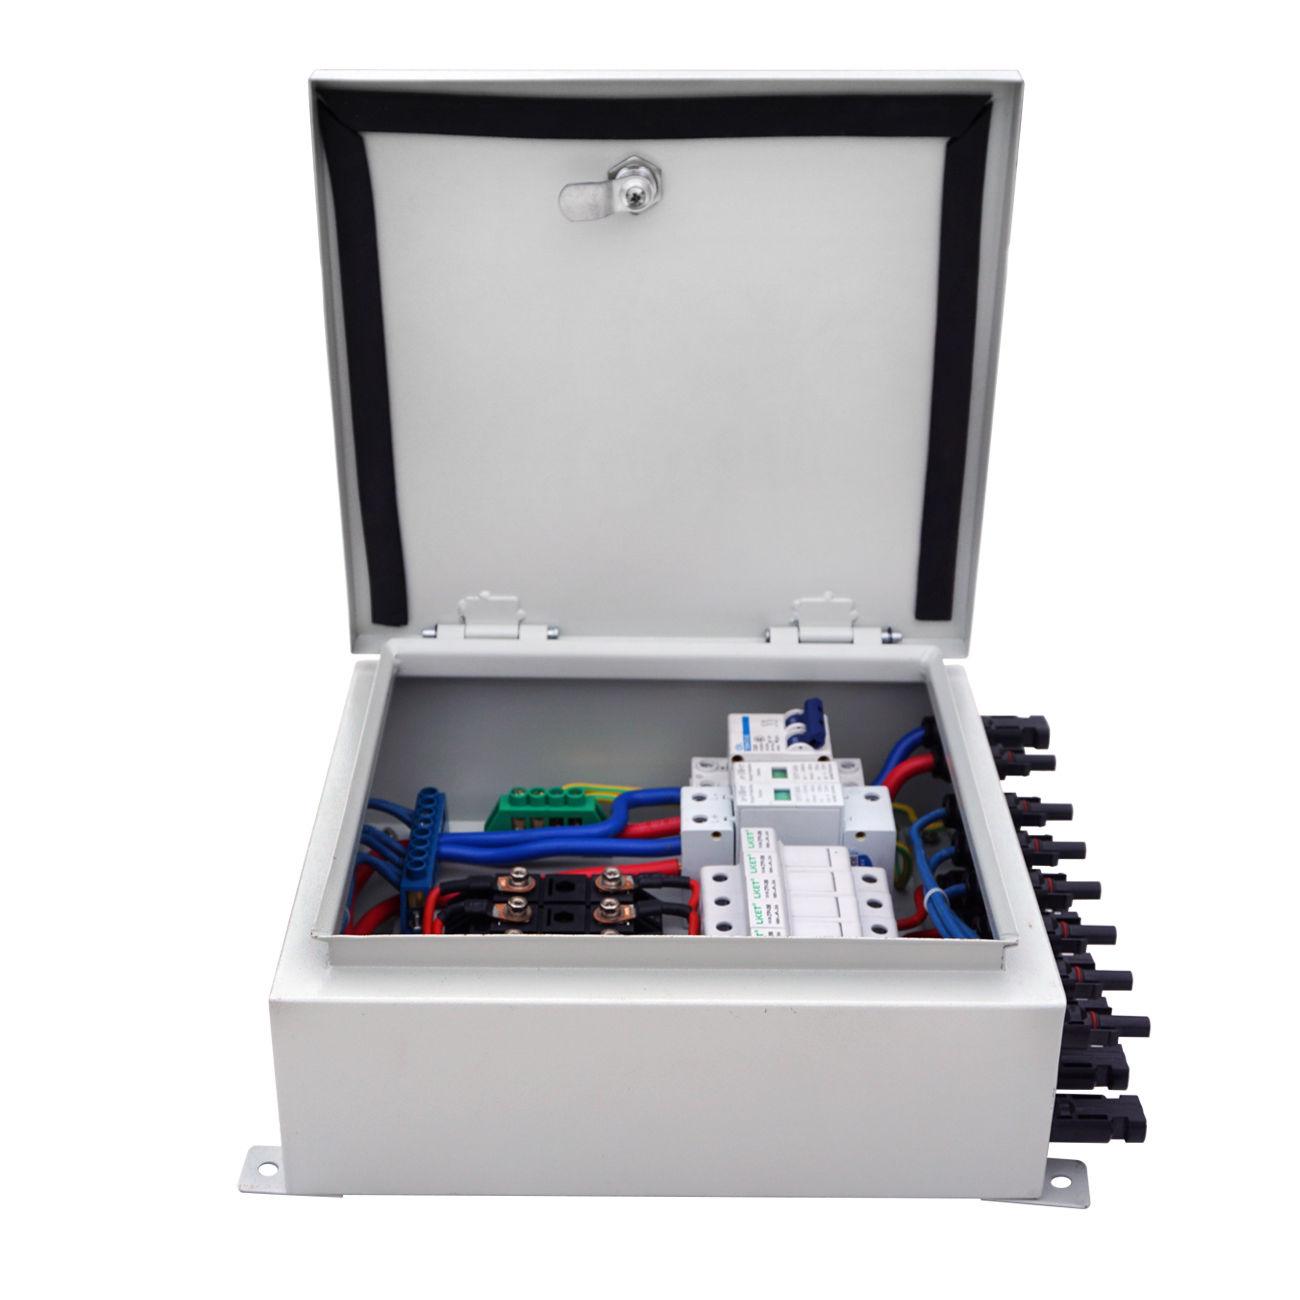 Luxury Solar Combiner Box Wiring Diagram Component Wiring Diagram - Solar combiner box wiring diagram